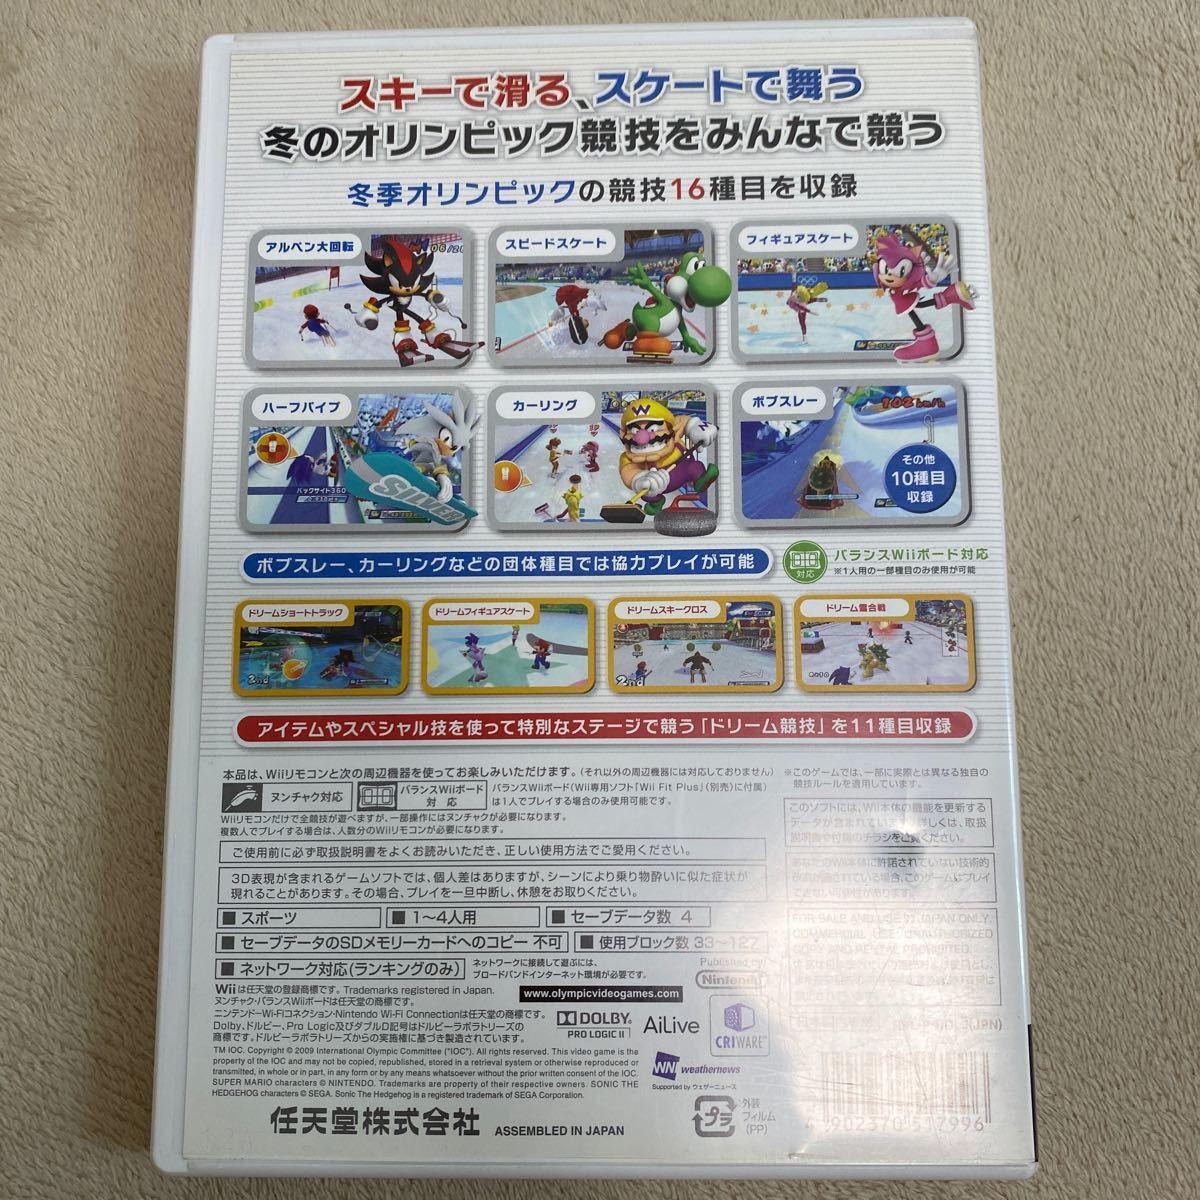 Wii スーパーマリオギャラクシー2 マリオ&ソニックATバンクーバーオリンピック Wiiソフト バンクーバーオリンピック マリオ